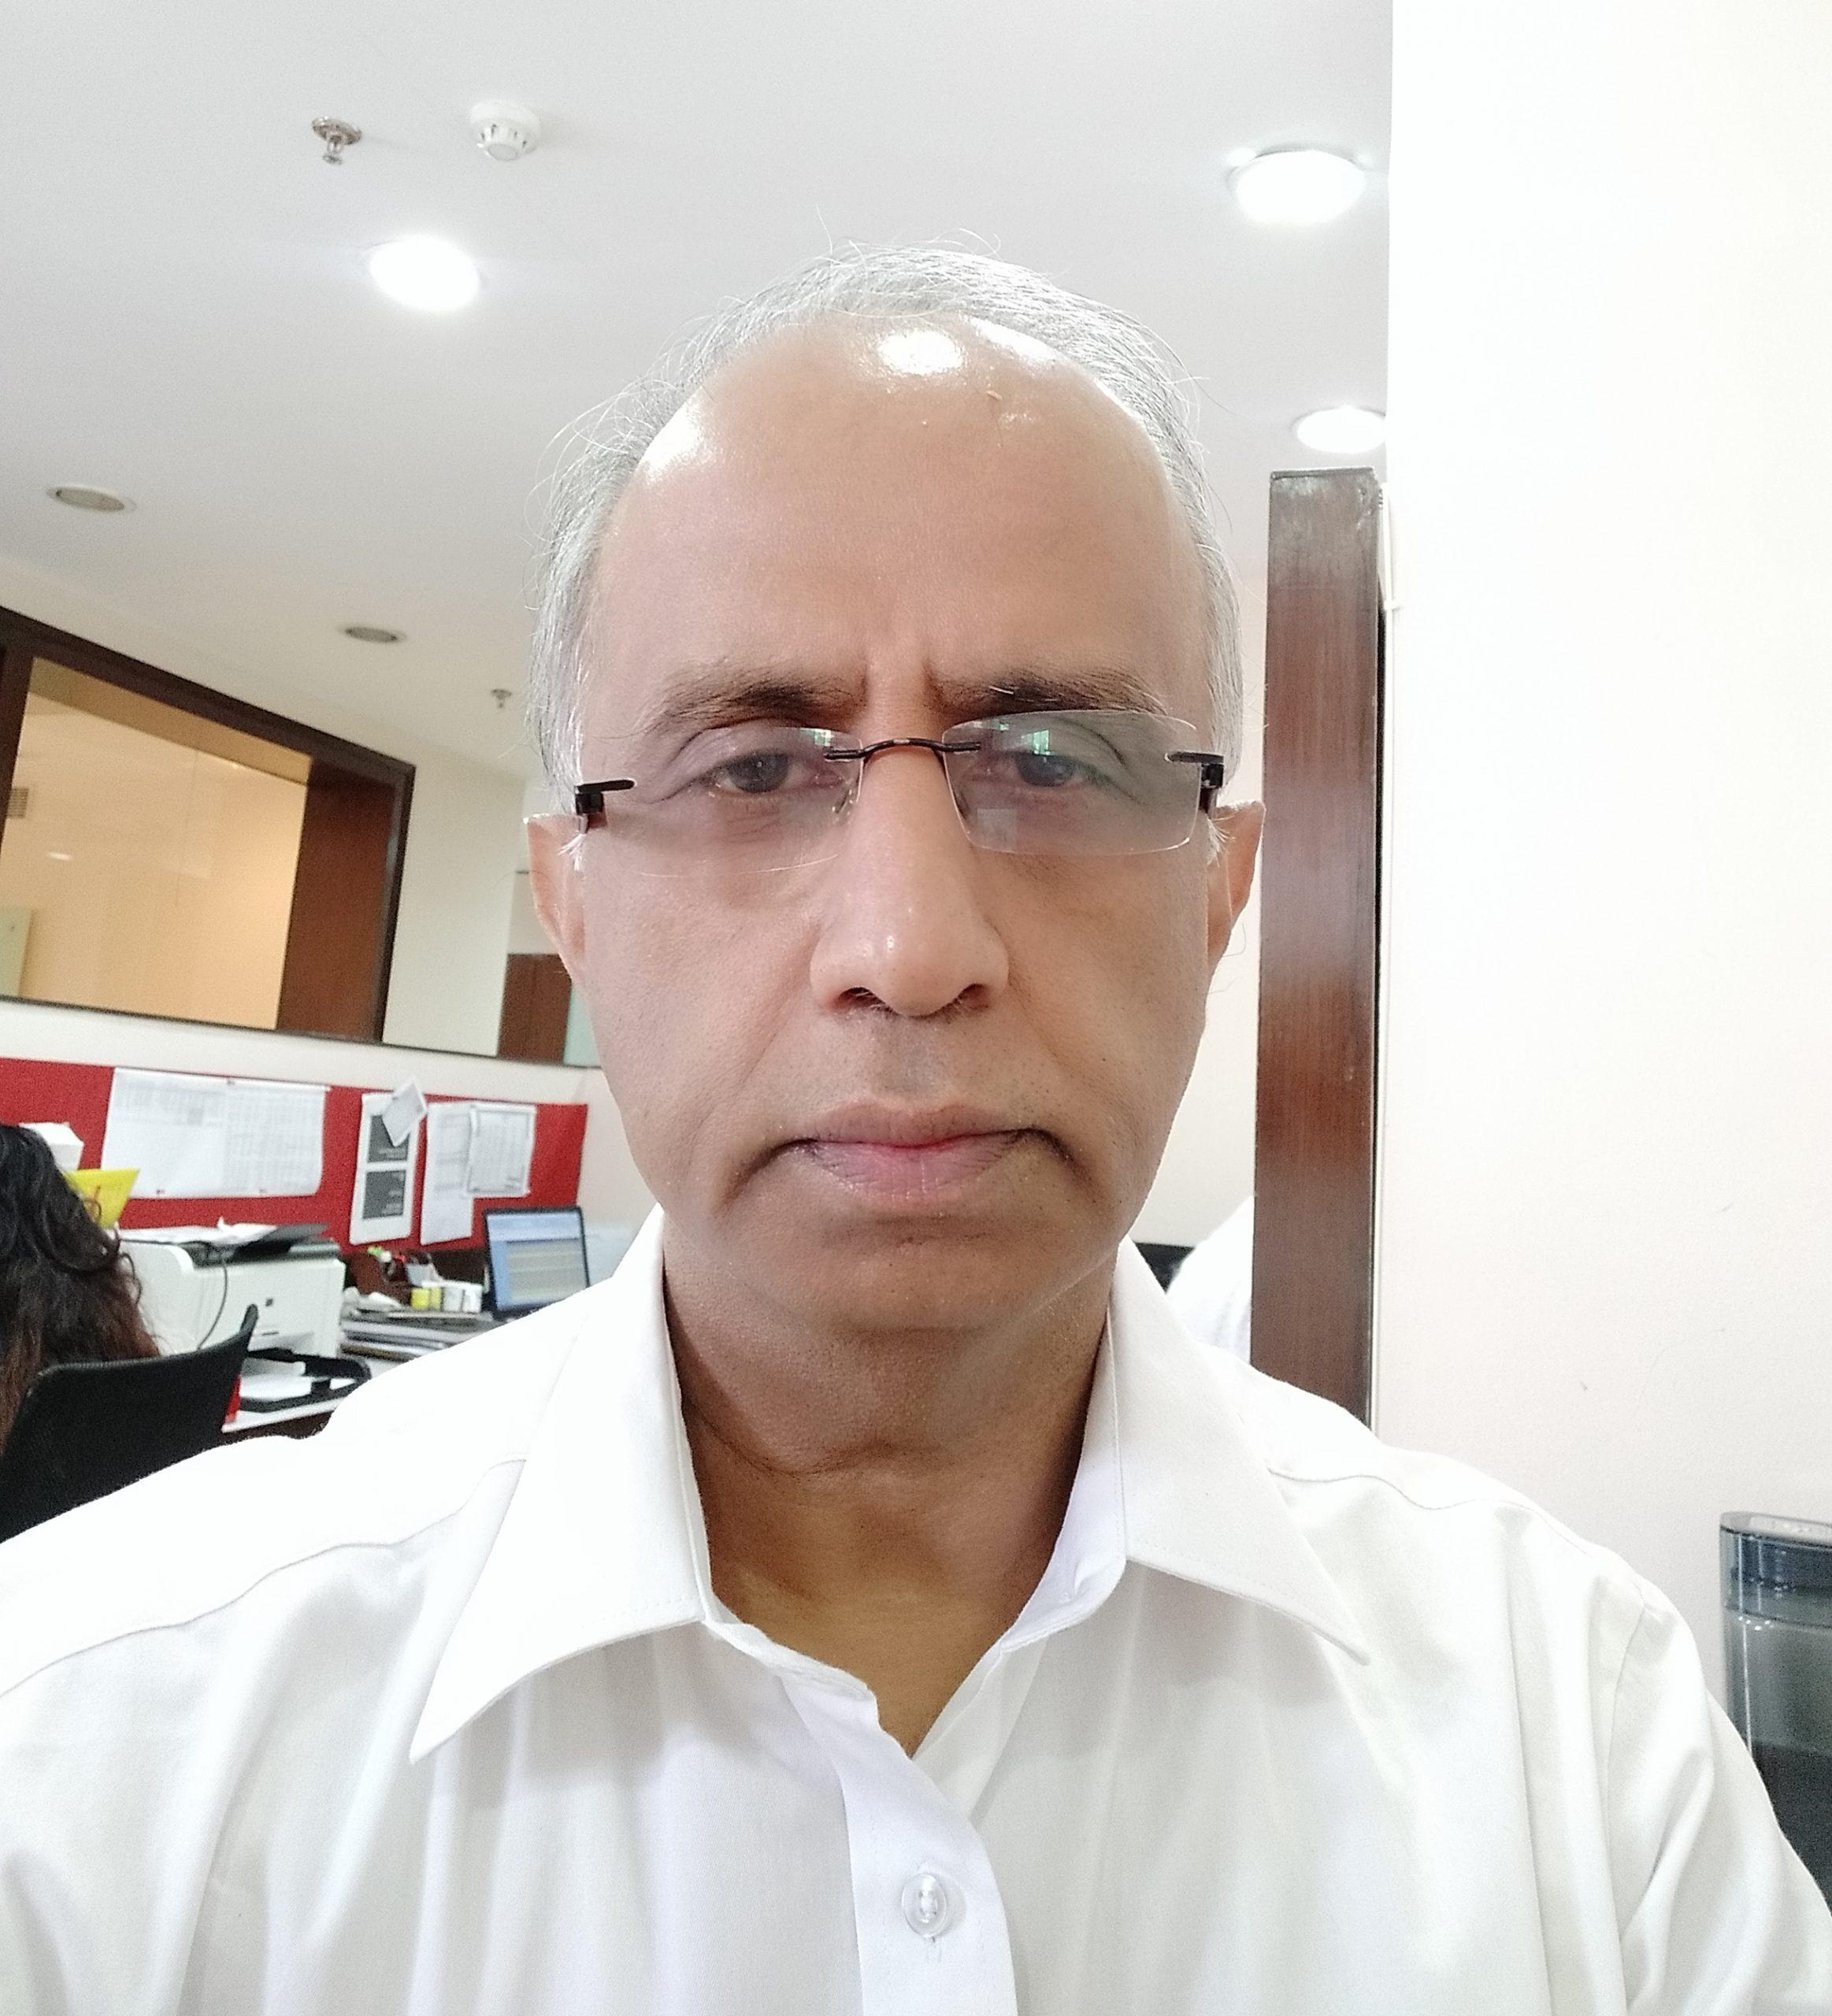 World Connect pvt ltd, Jaideep Massand, New Delhi, India